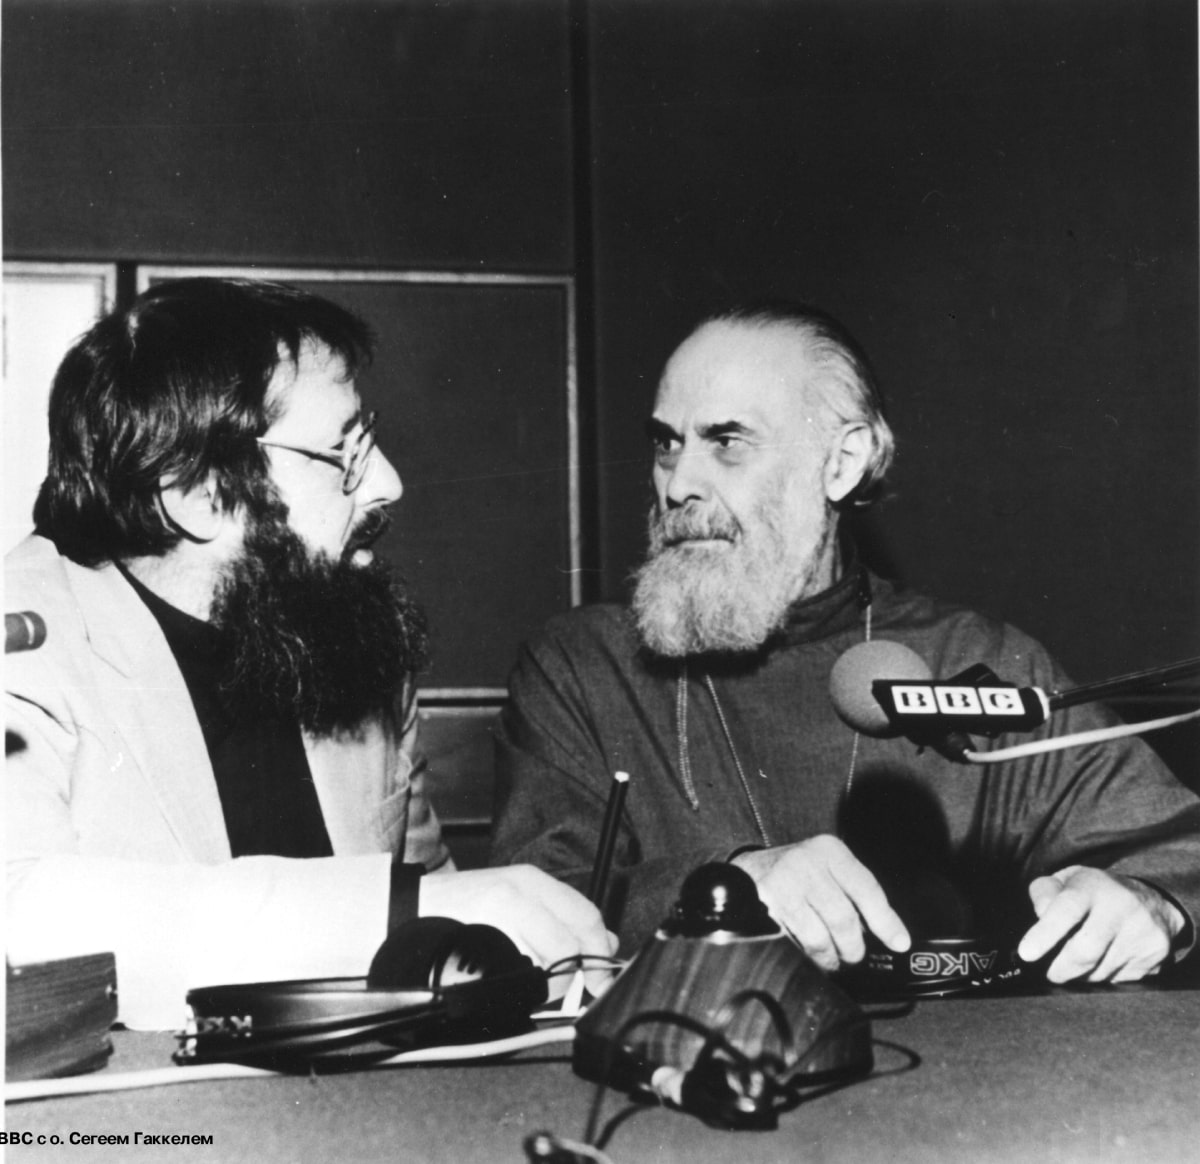 1993 BBC. With archpriest Sergey Hackel